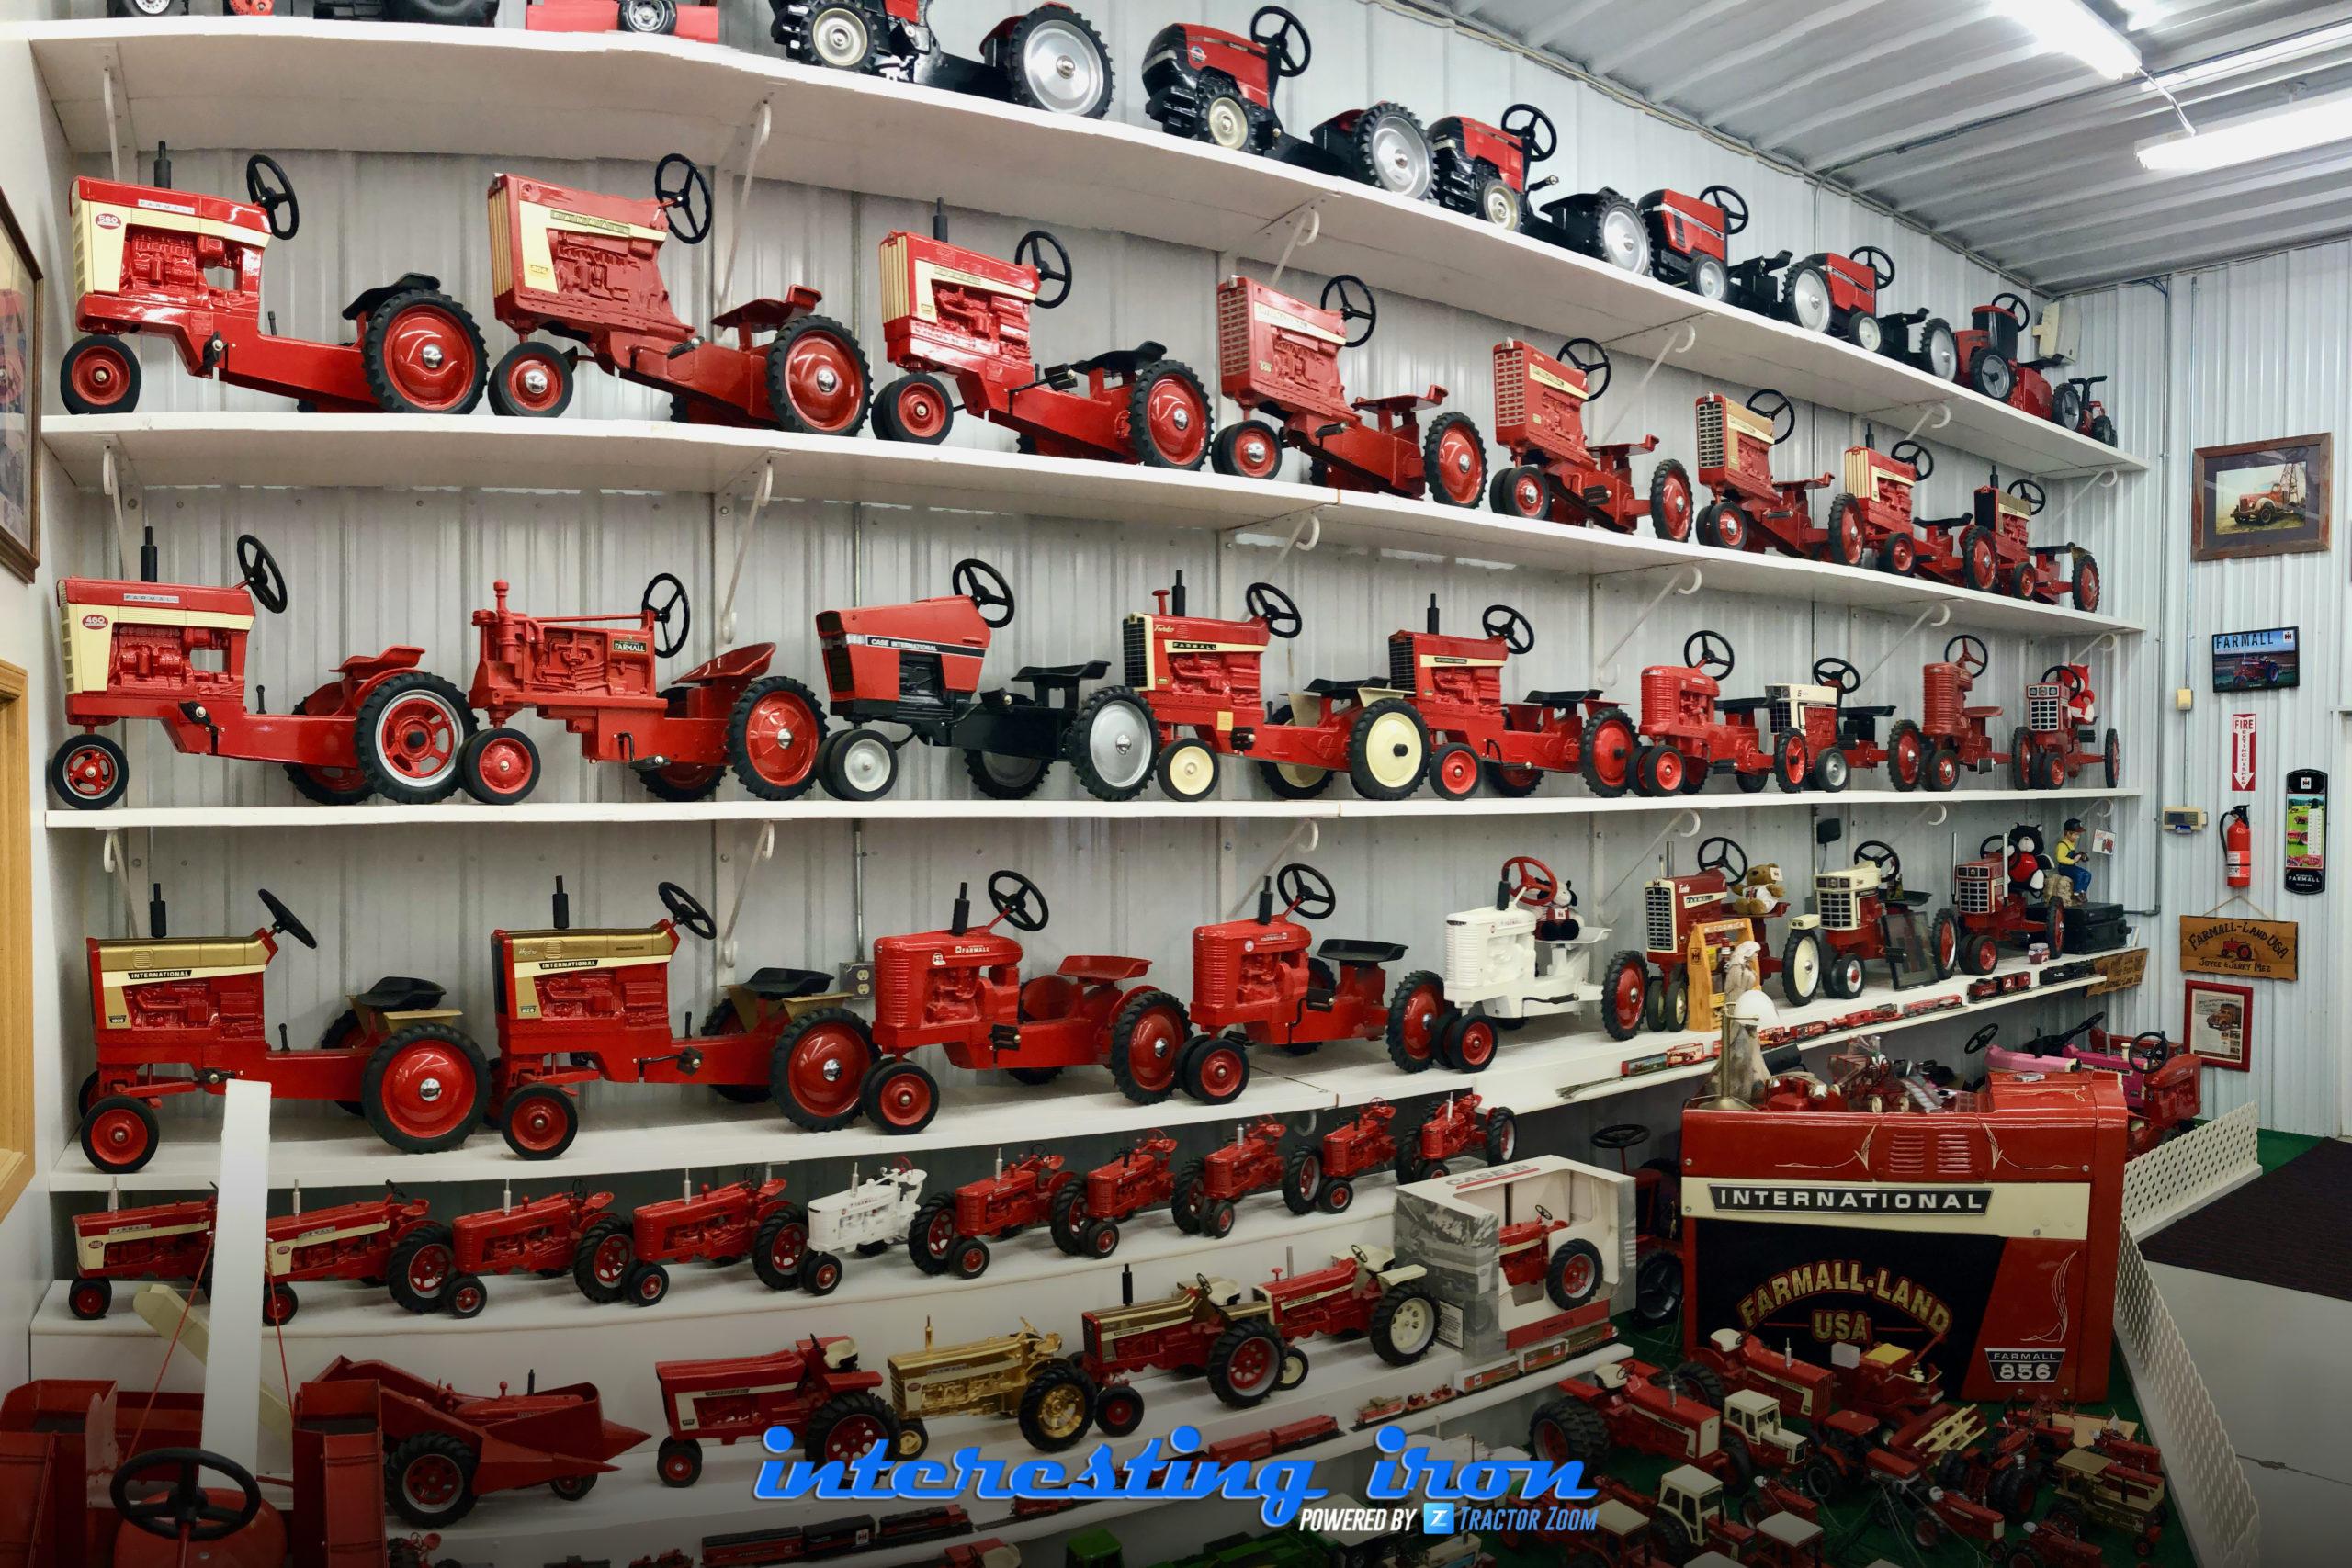 Farmall pedal tractors